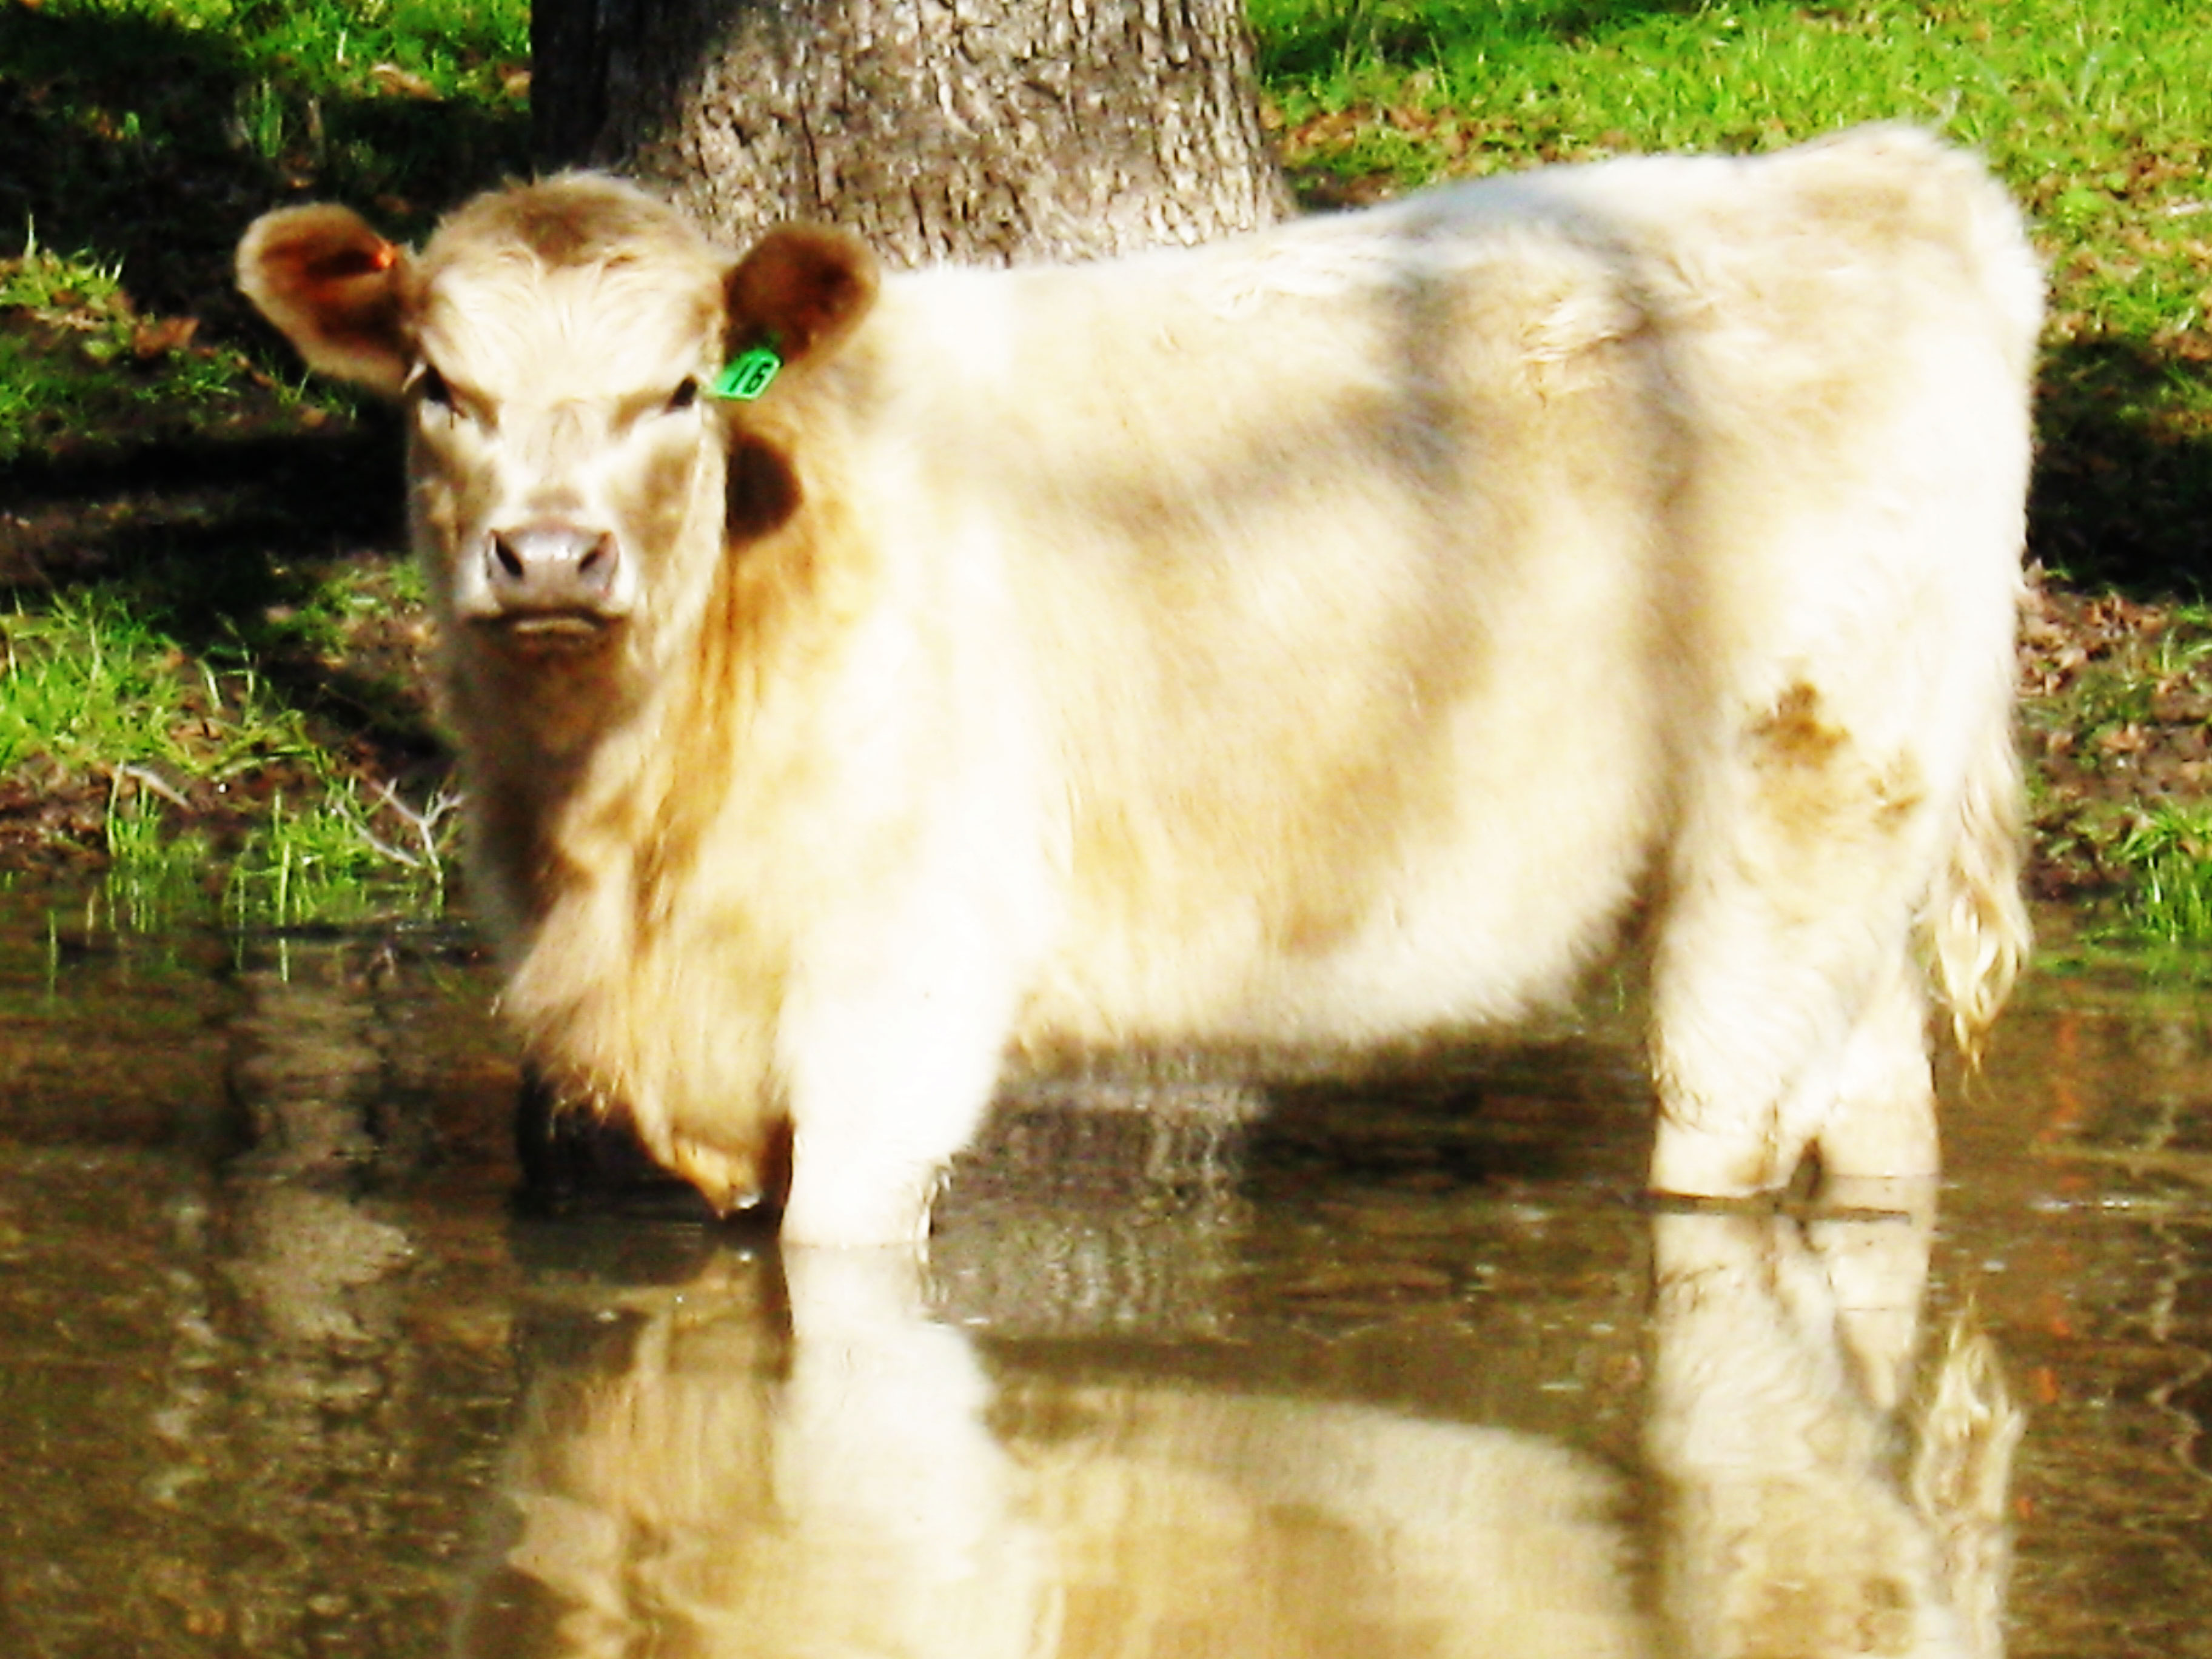 Murray Grey Yearling Heifer